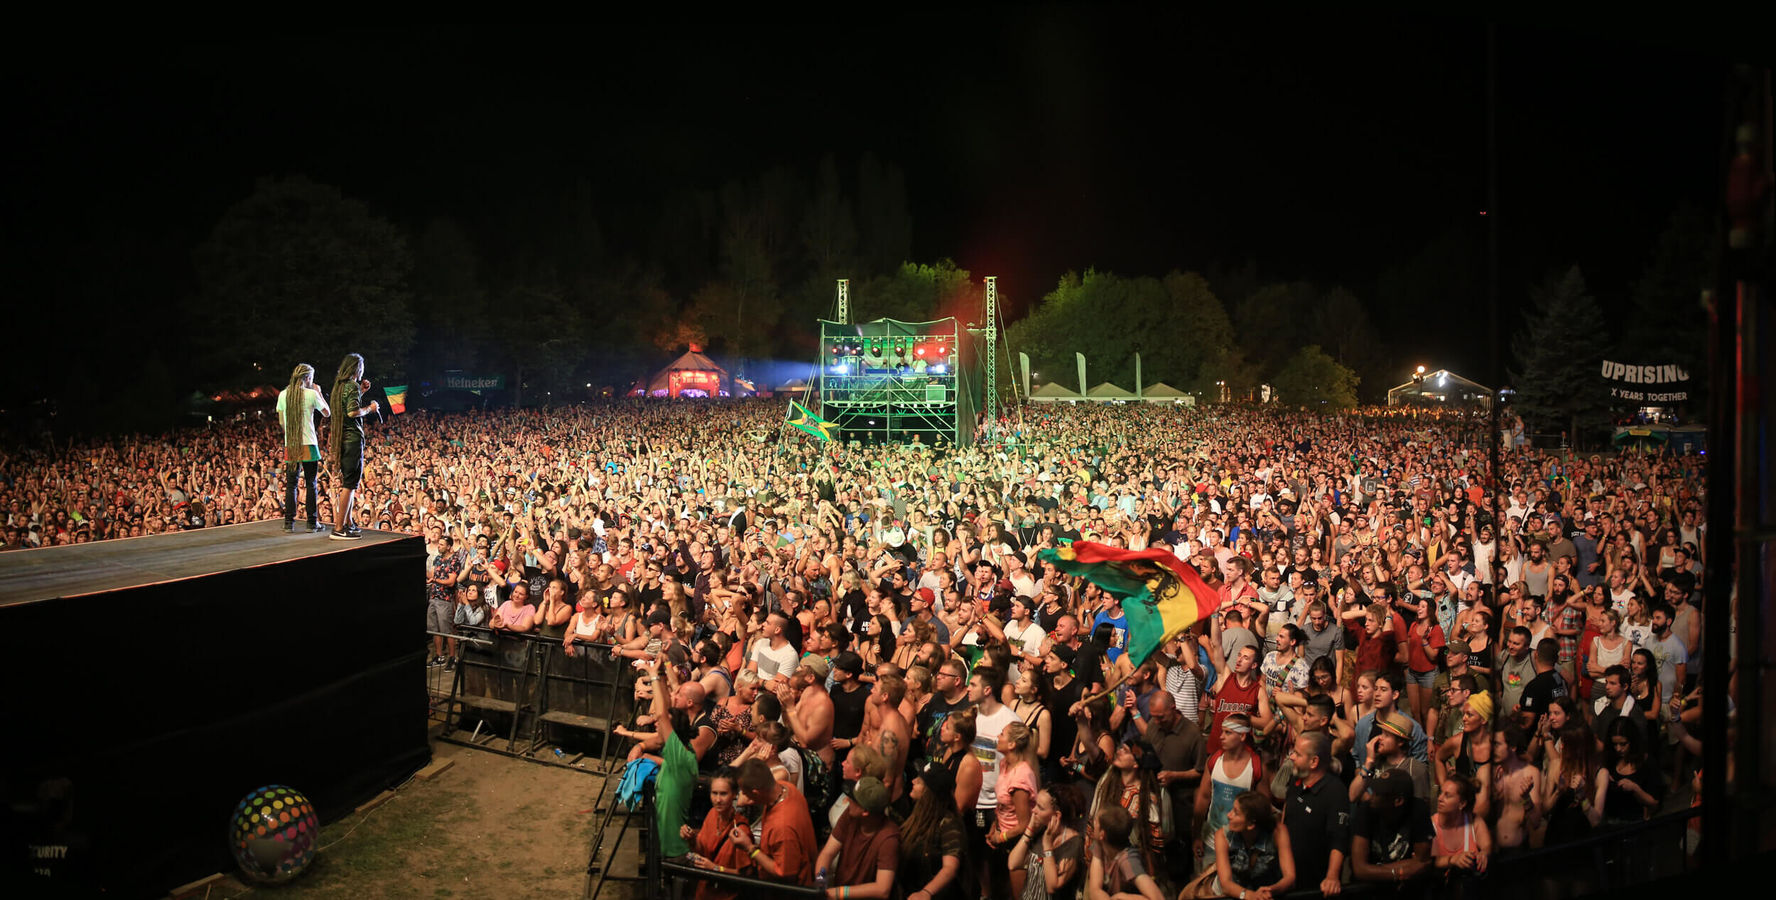 cd9985919 Uprising reggae festival - Slovakia.travel